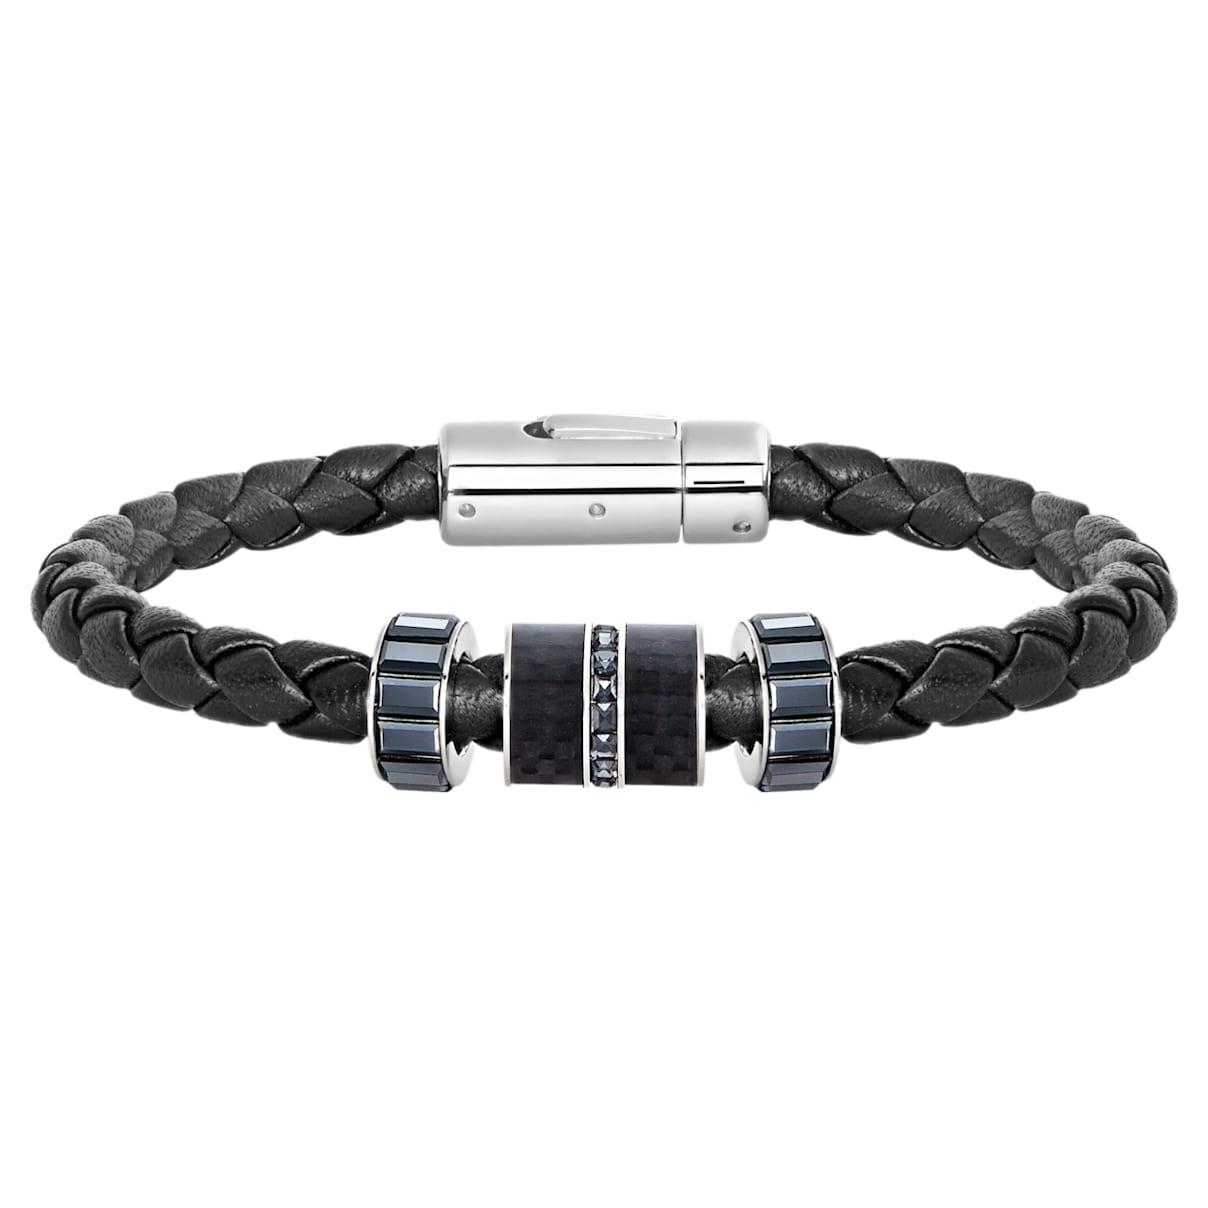 Diagonal Bracelet, Leather, Black, Stainless steel